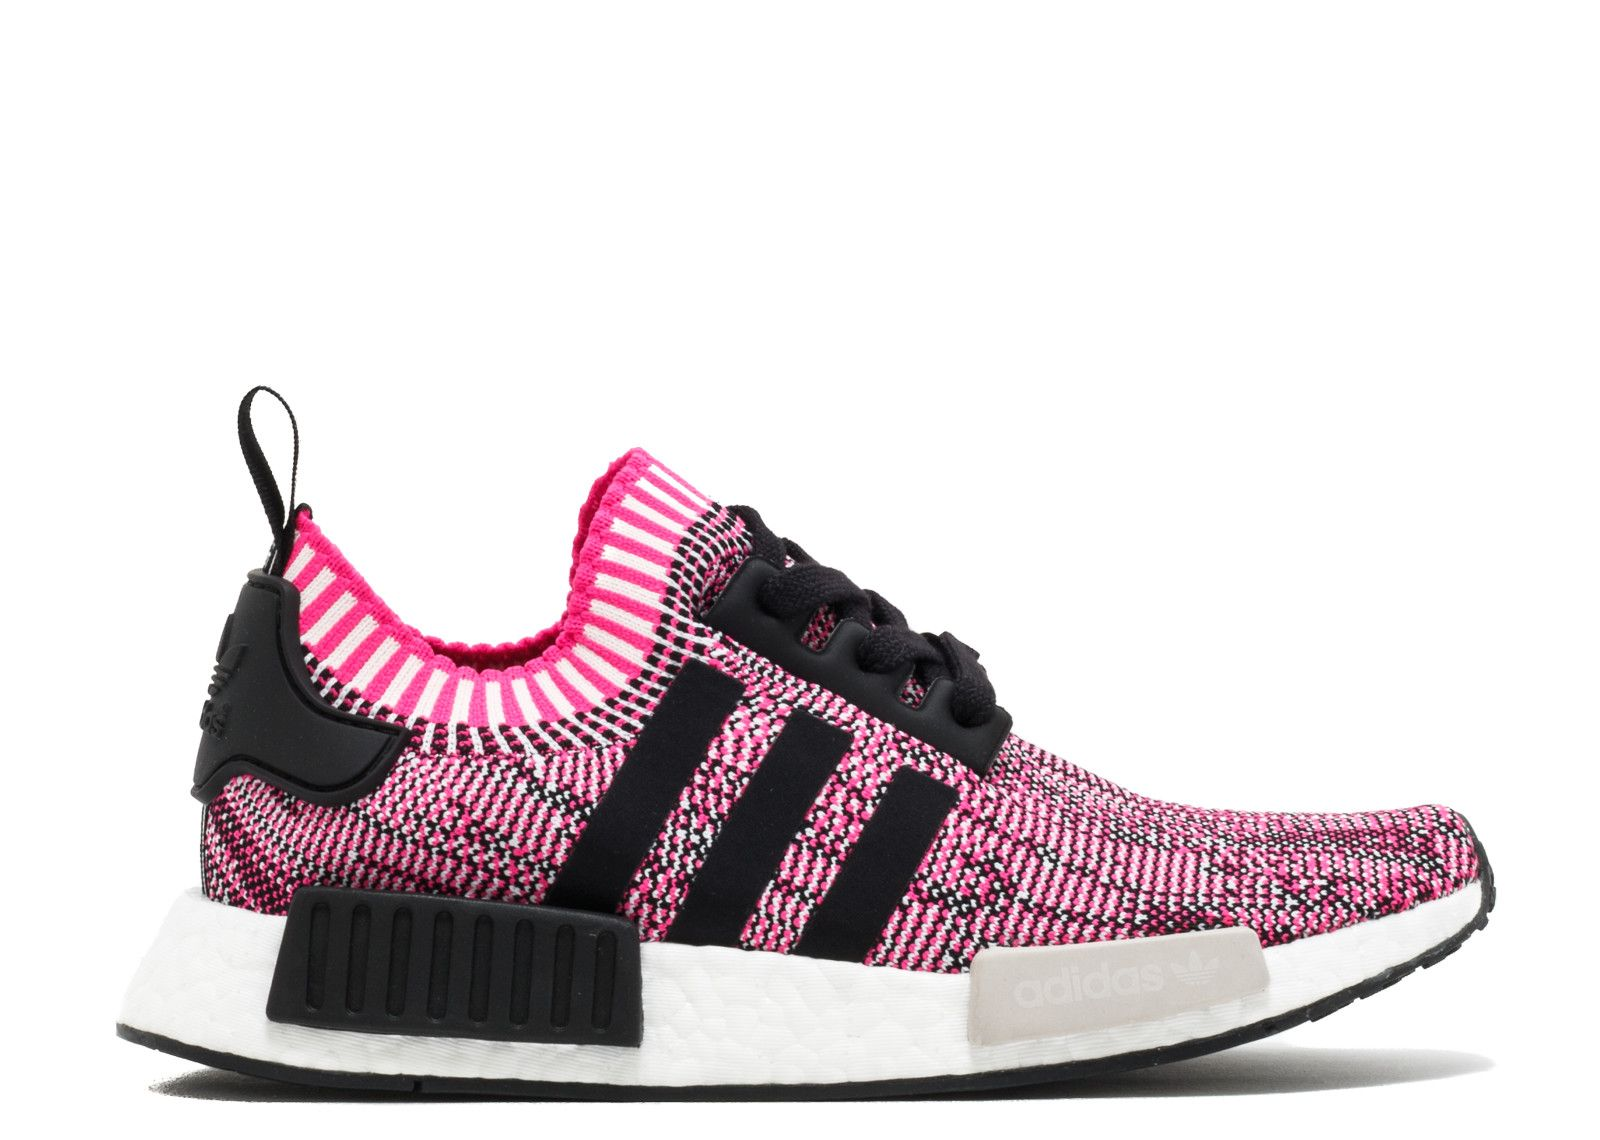 9d23b2338f249 Adidas NMD R1 Women PK Bb2363 Shock Pink Core Black Running White Ftw  Trainers